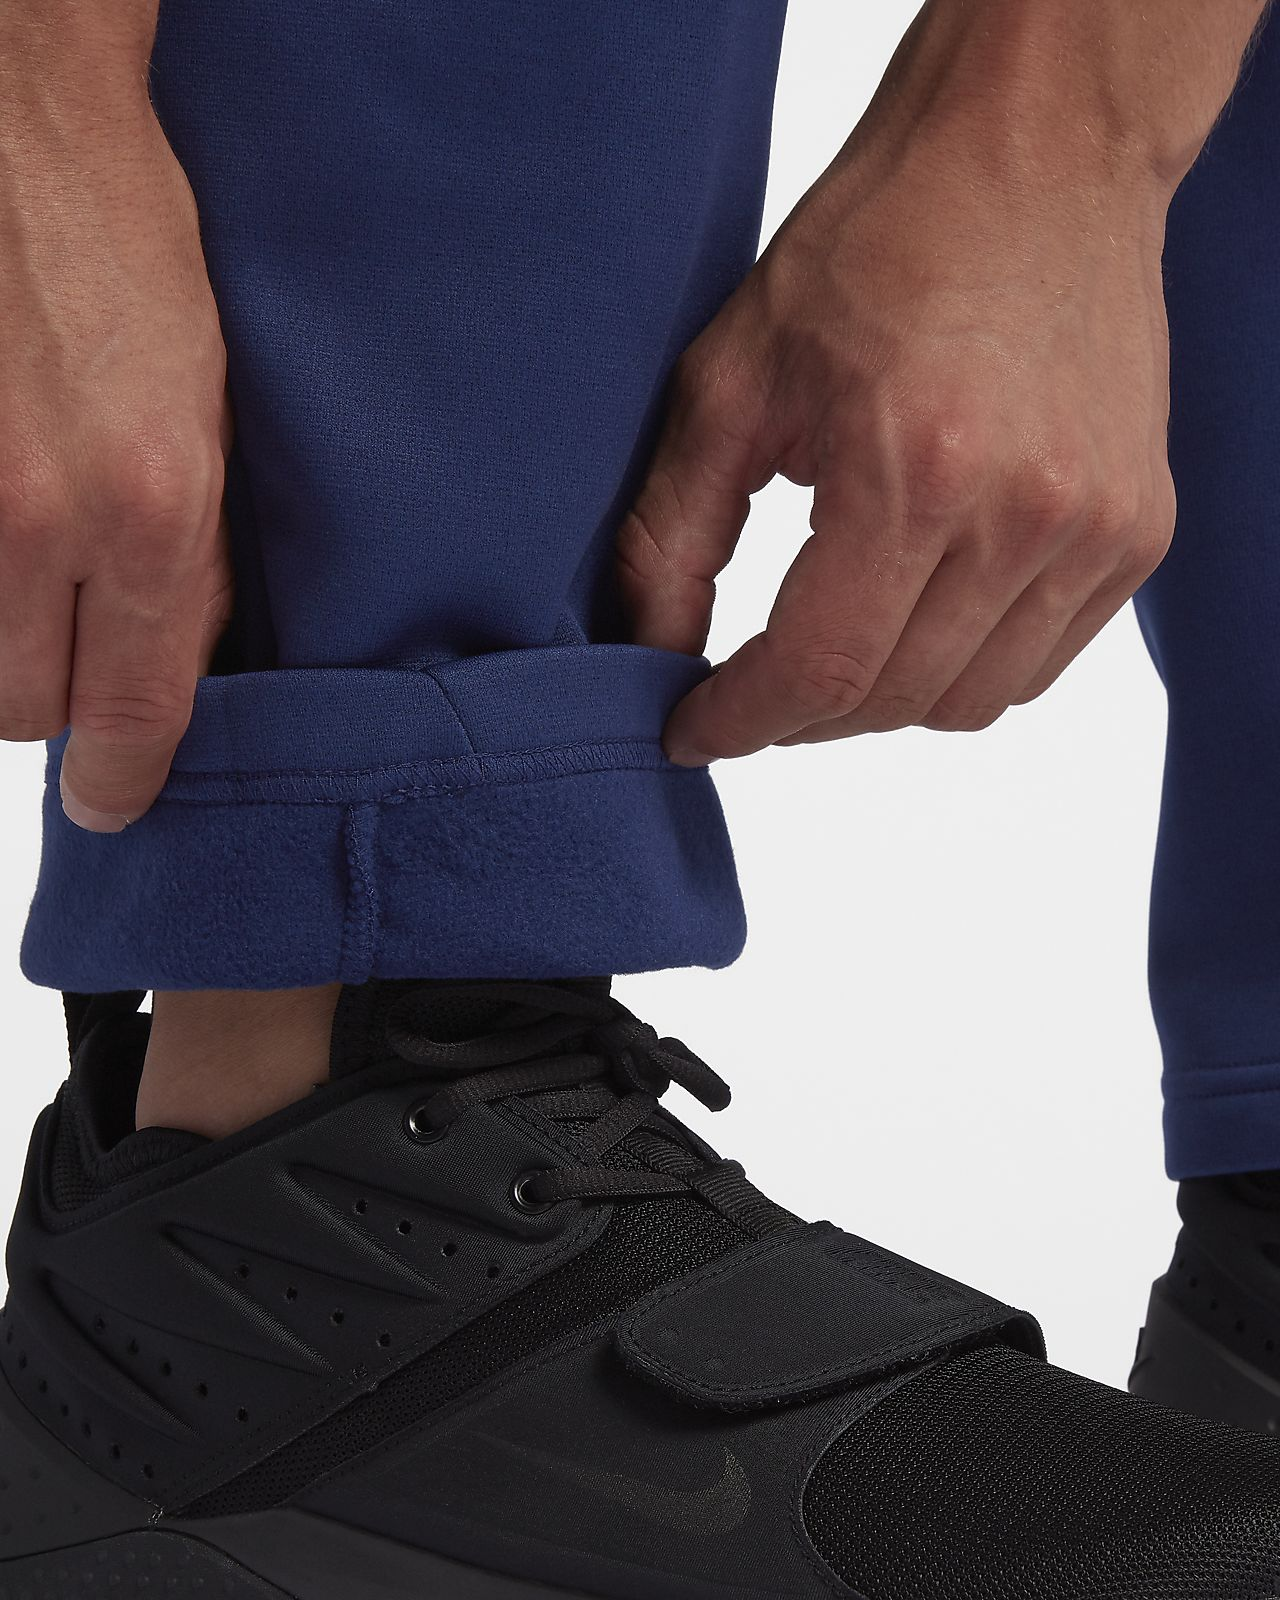 NIKE Men/'s $55 THERMA Fleece Training Pants NEW 932253-010 DRI-FIT BLACK S-XL